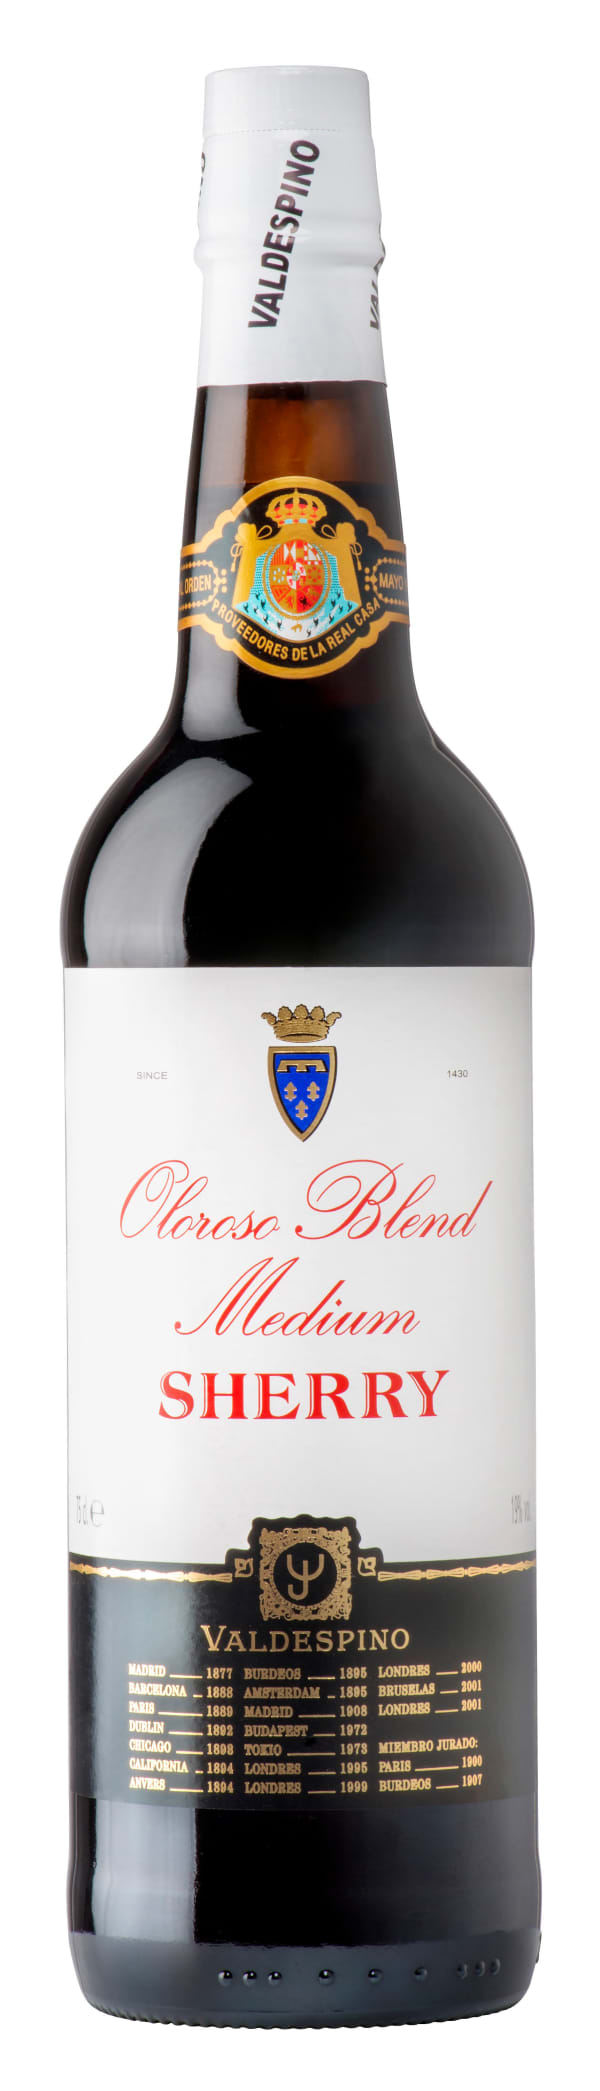 Valdespino Oloroso Blend Medium Sherry